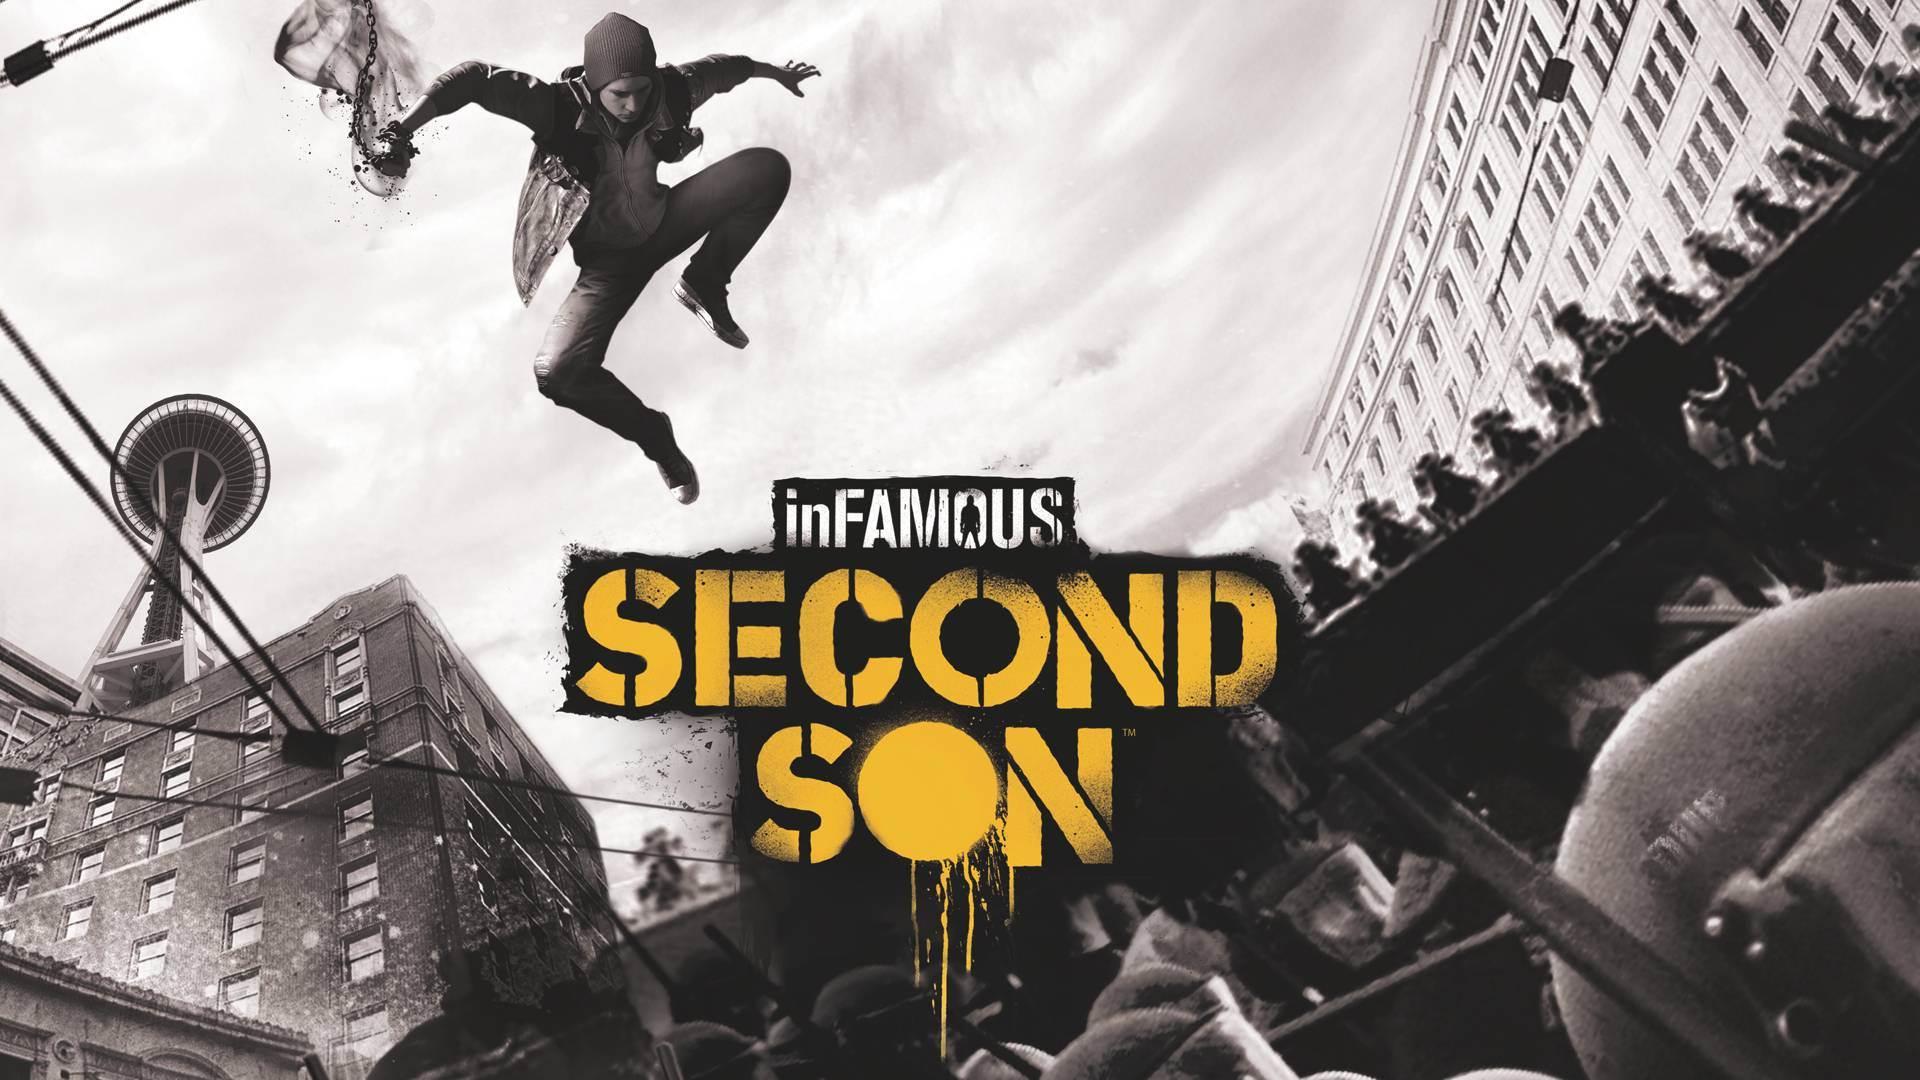 infamous-second-son-ps4-wallpaper-1080p